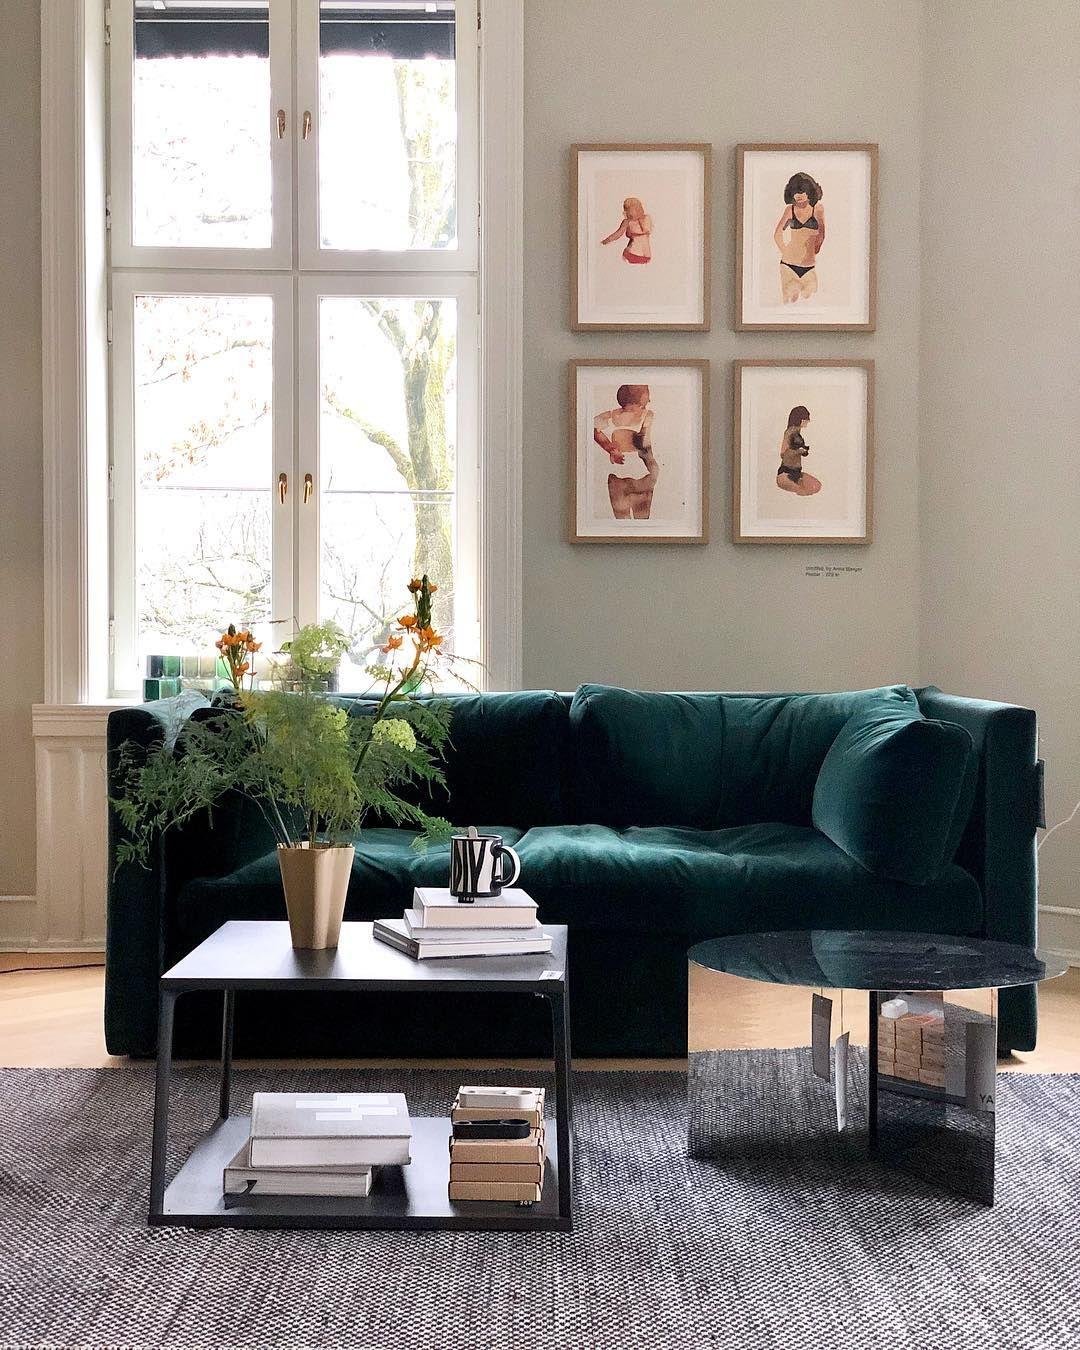 A Simple Metal Frame Contains The Six Cushions That Make Up This Sofa Dizajn Mebeli Dizajn Stula Metallicheskaya Mebel